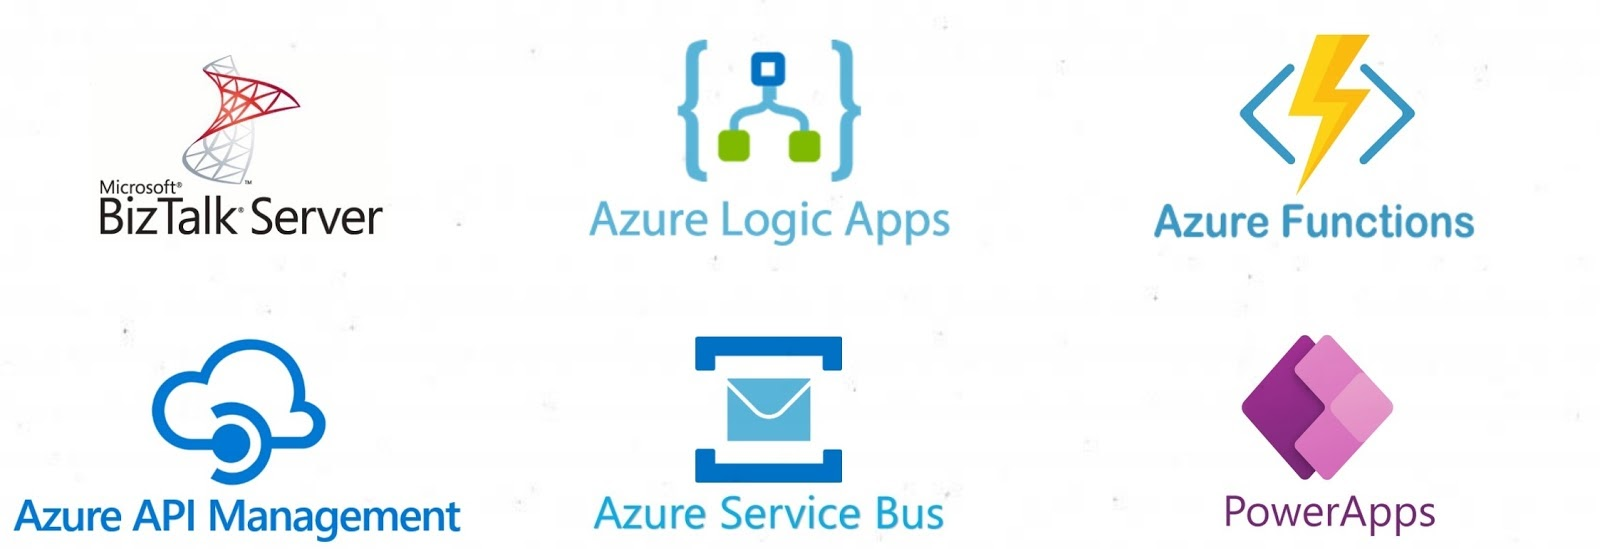 March 15, 2021 Weekly Update on Microsoft Integration Platform & Azure iPaaS